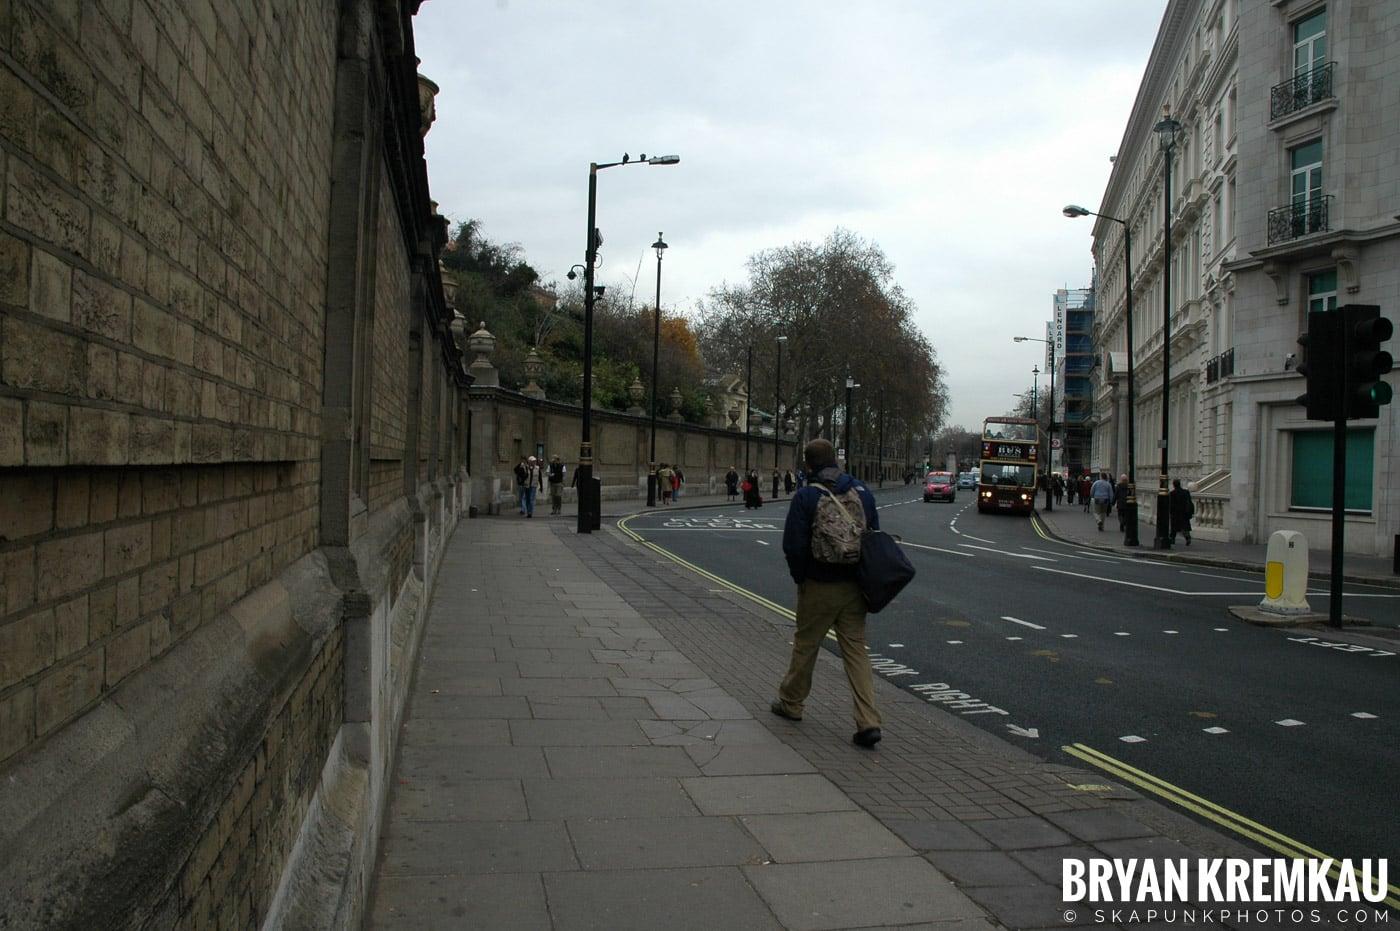 London, England - Day 5 - 12.20.05 (16)